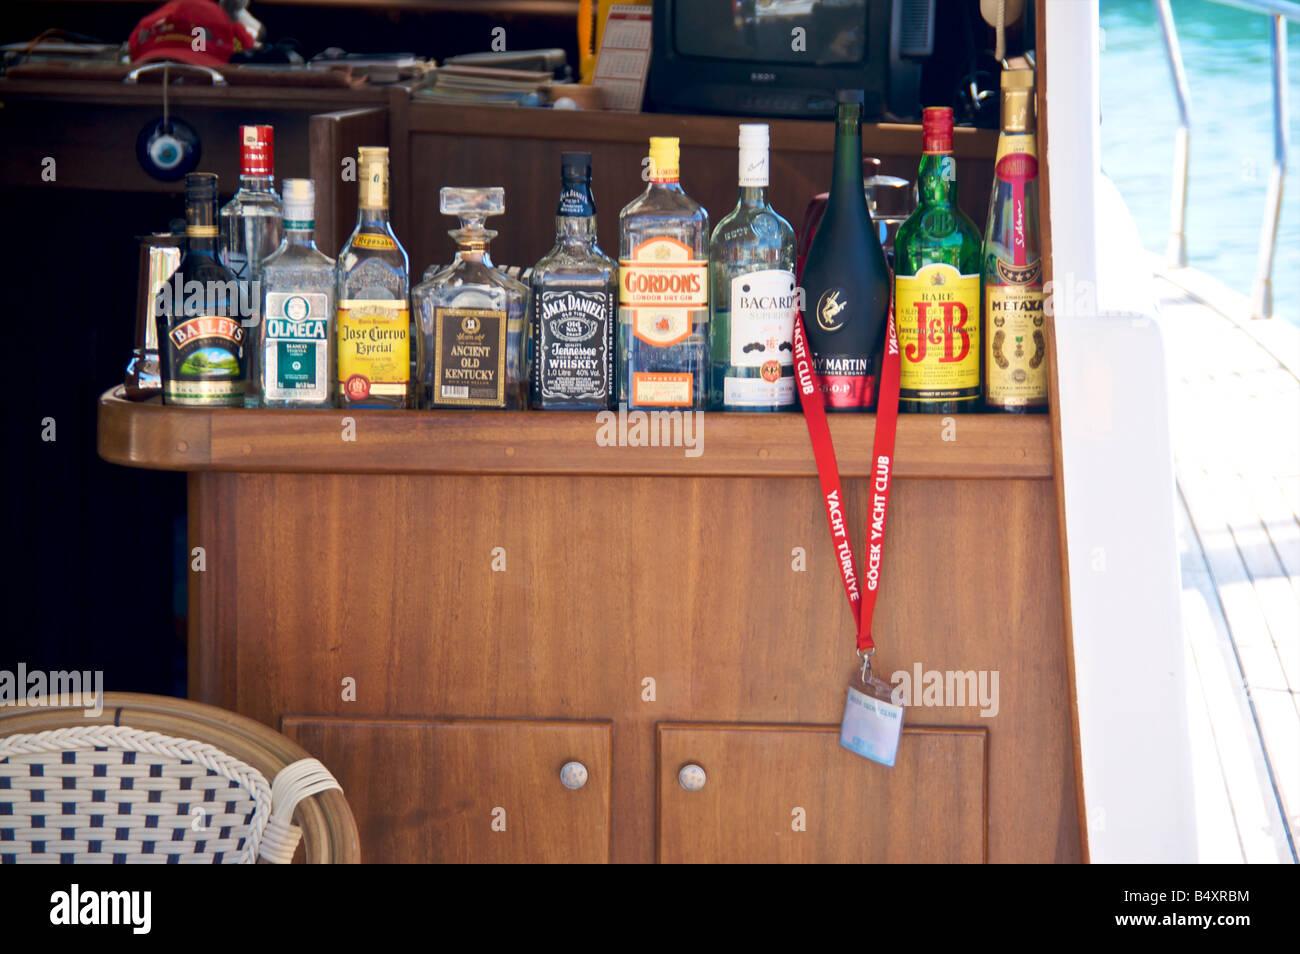 Bar on a Yacht in Goçek Turkey showing a Goçek yacht club badge - Stock Image